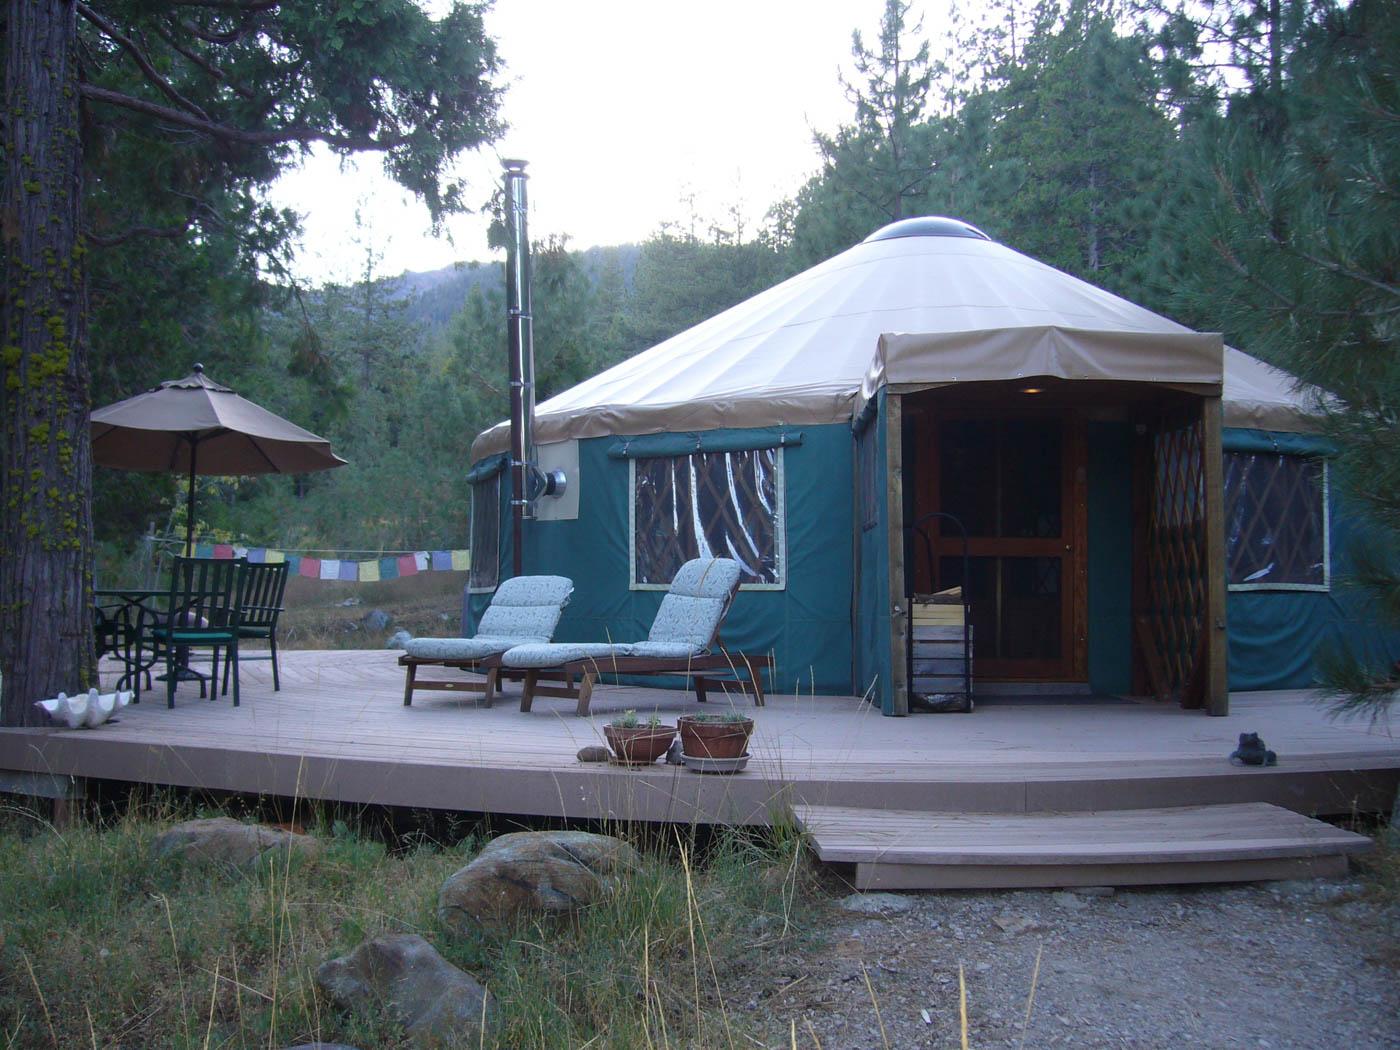 Creekside Yurt At Mount Shasta In California United